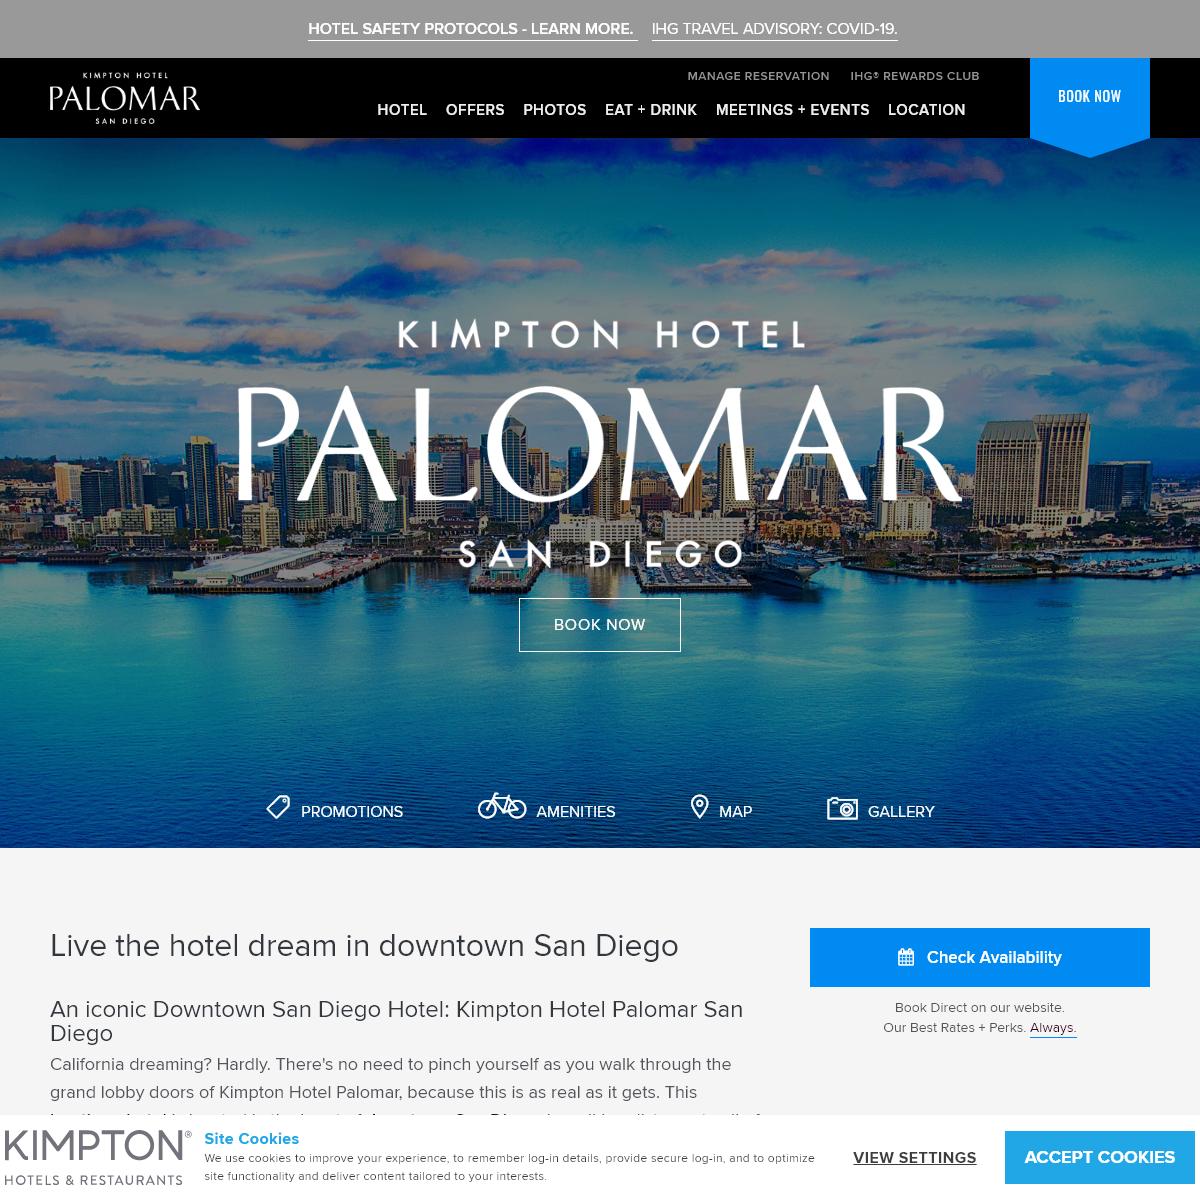 Downtown San Diego Hotels - Kimpton Palomar Hotel San Diego